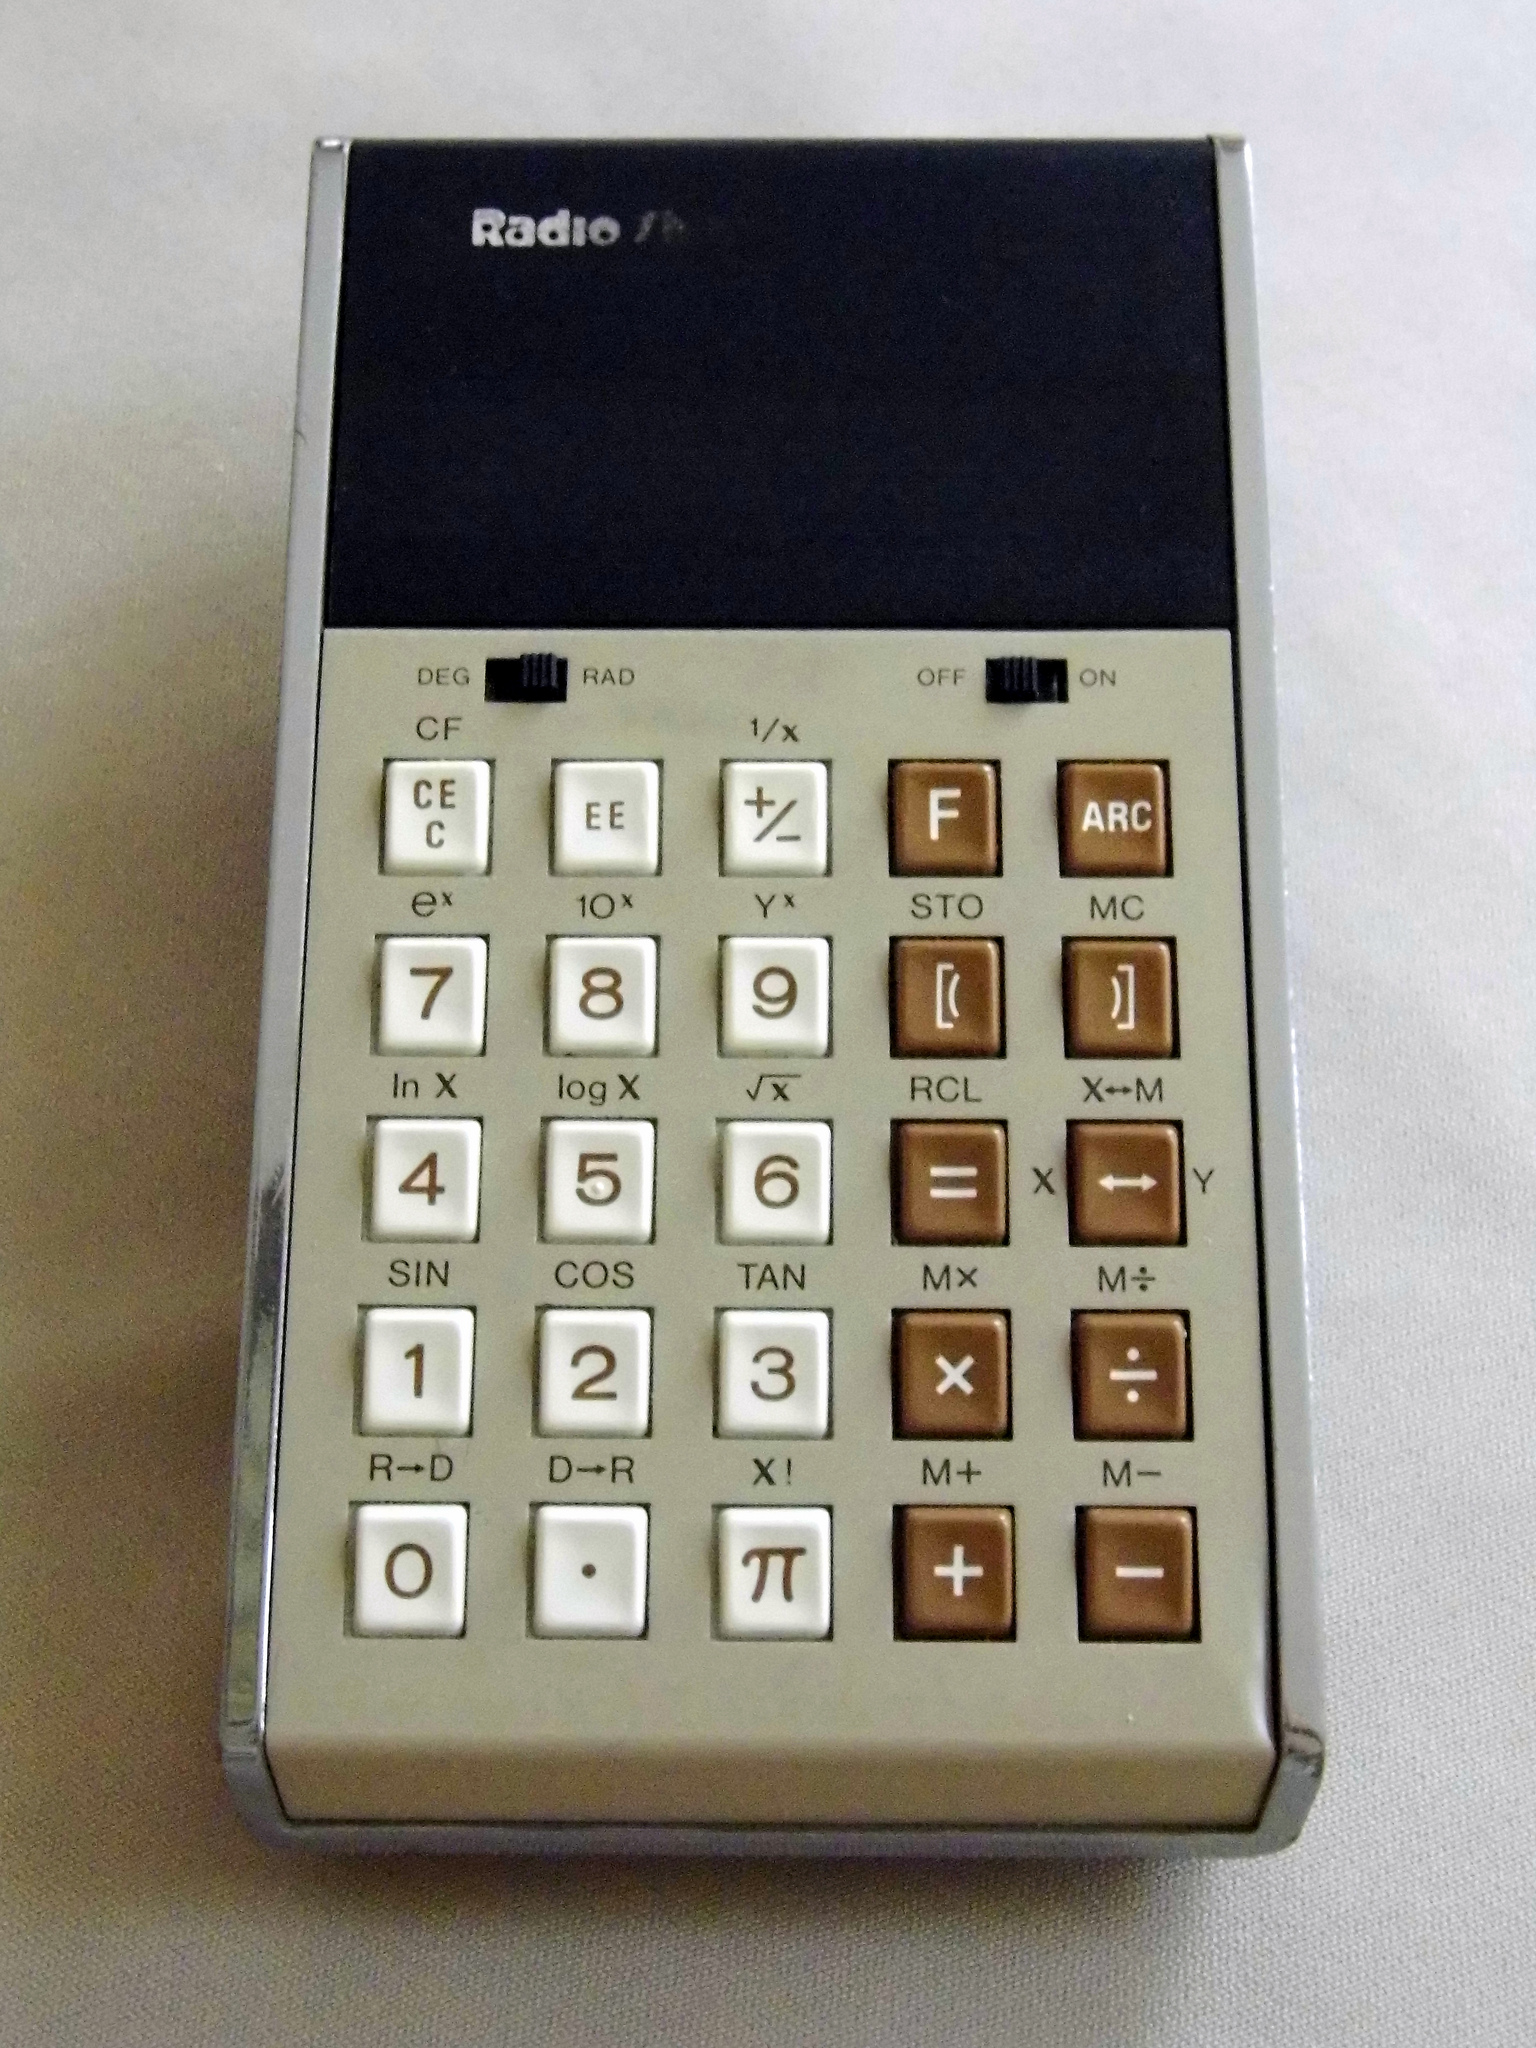 A Brief History of Calculators in the Classroom